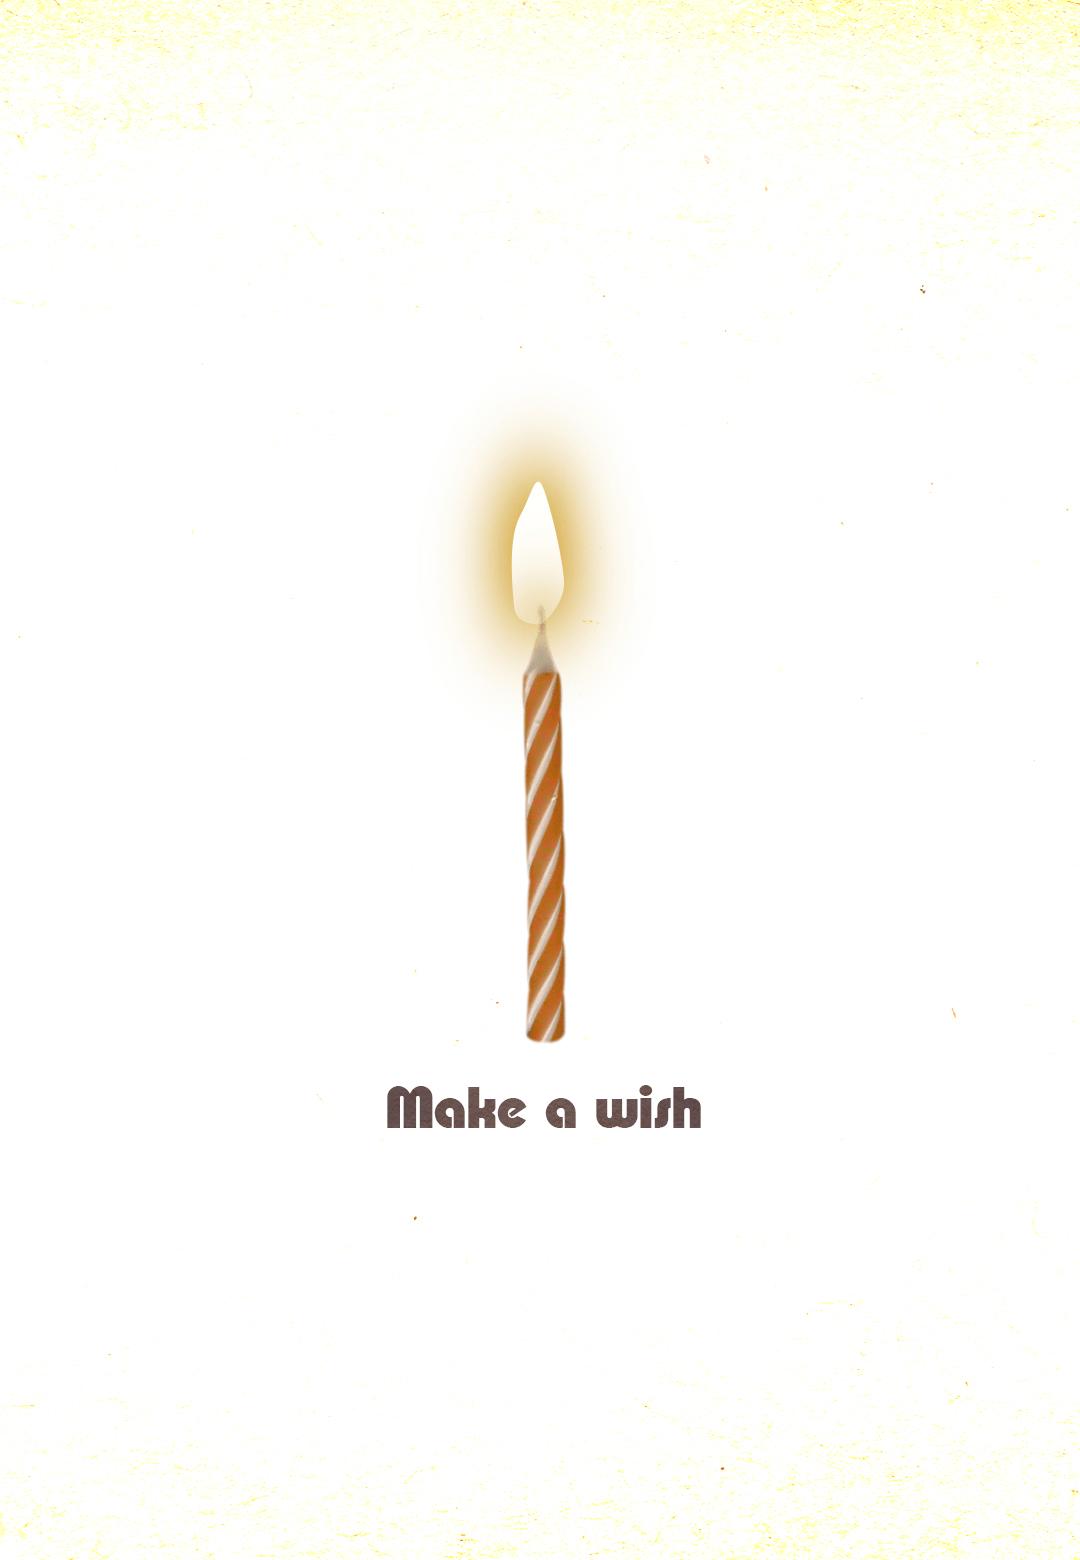 Free printable birthday card make a wish greetings island bd free printable birthday card make a wish greetings island m4hsunfo